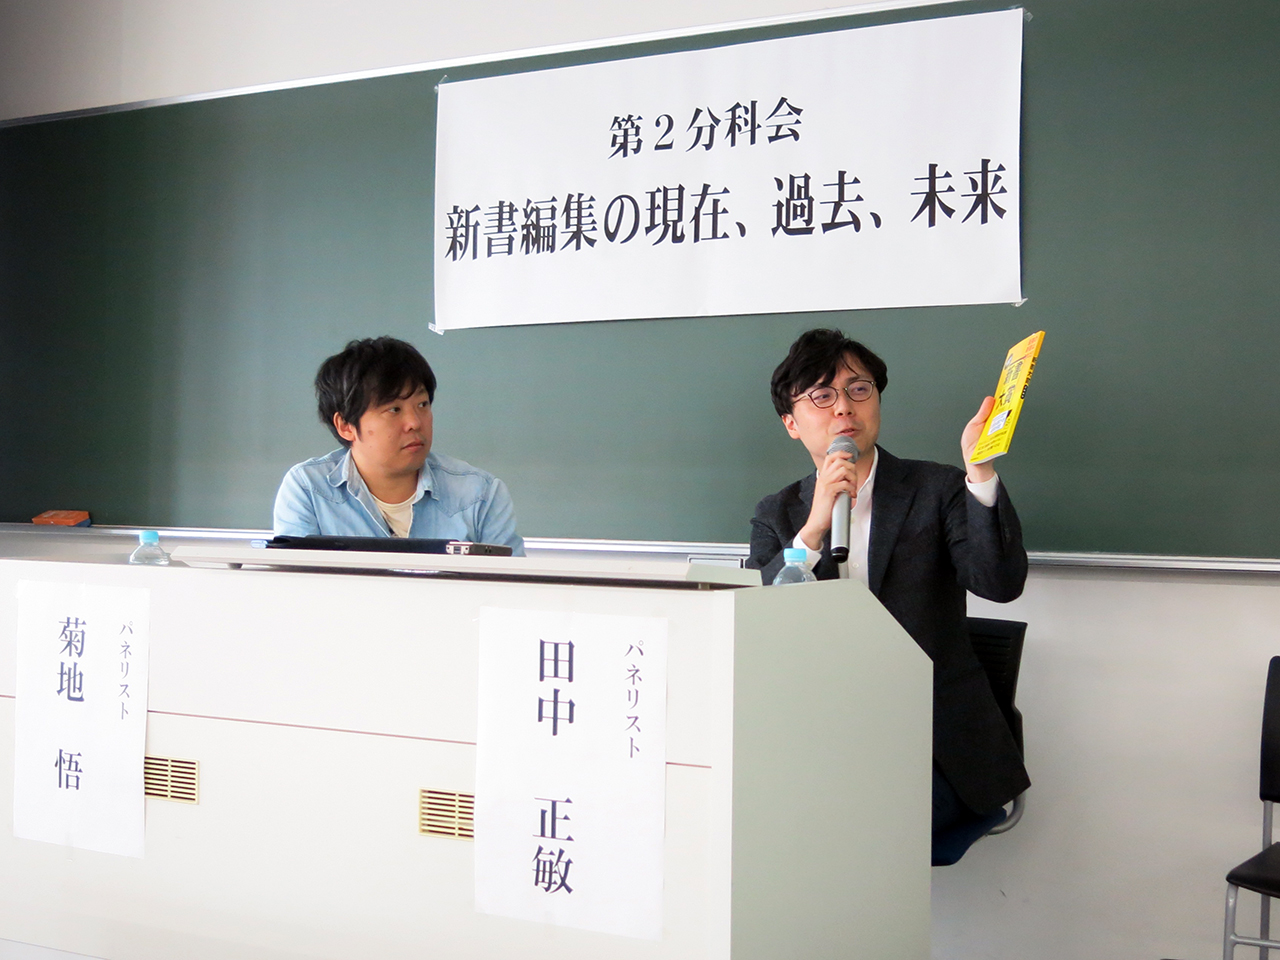 菊地氏と田中氏